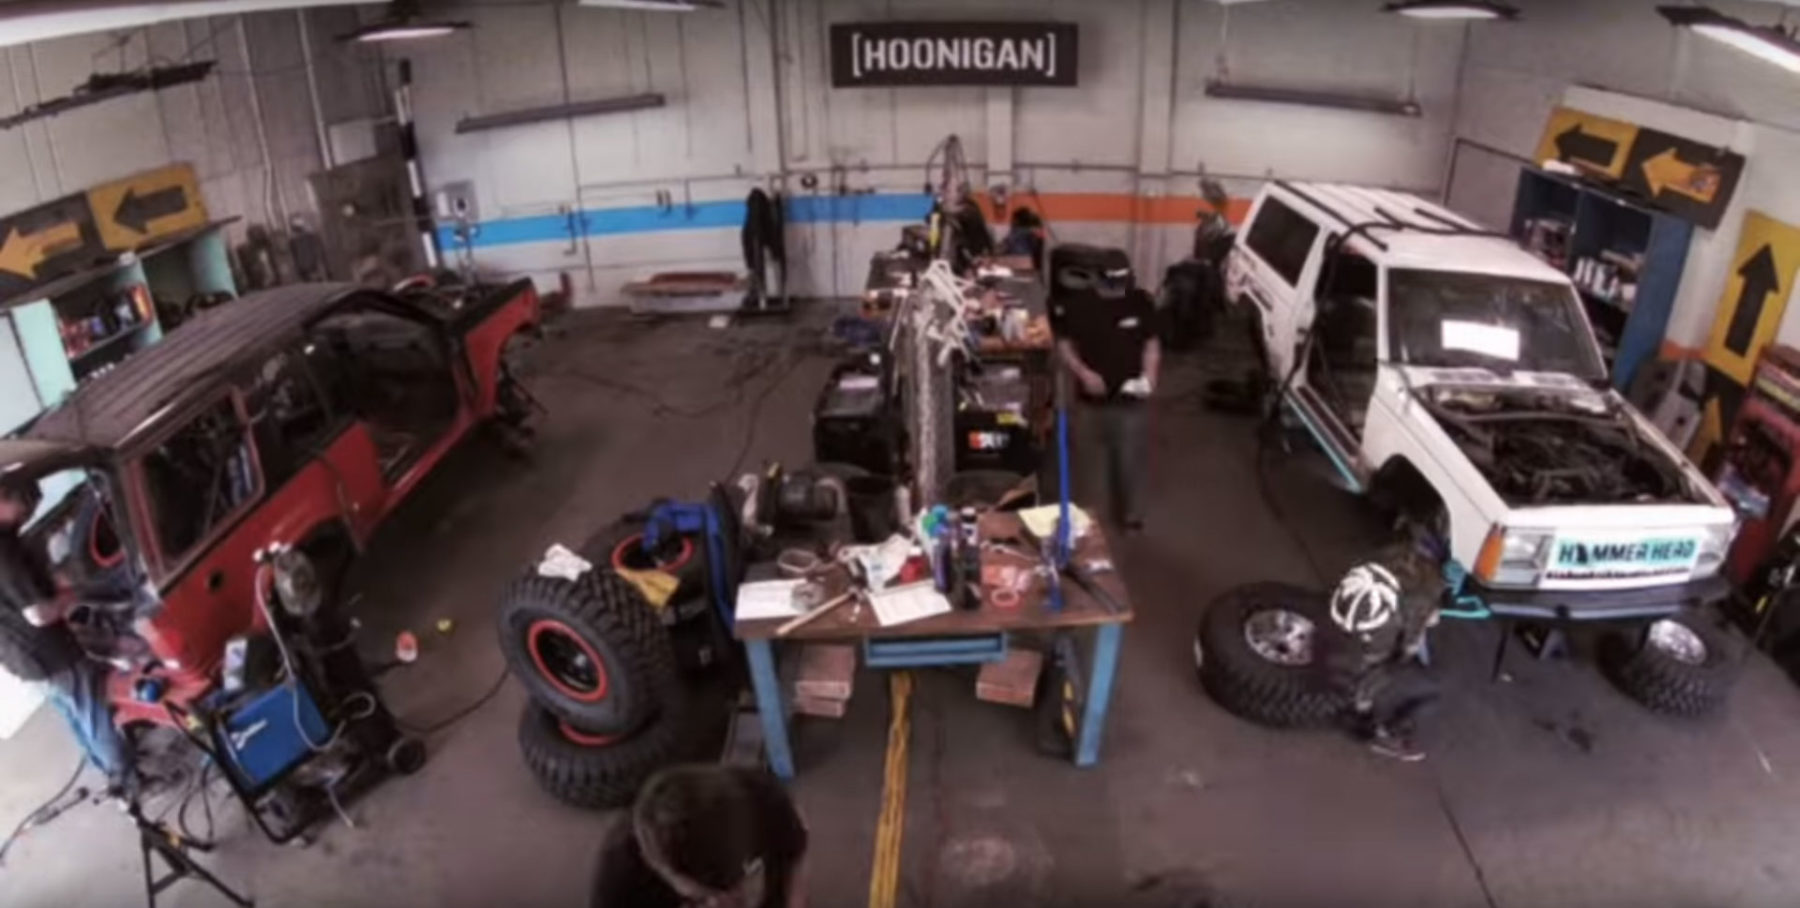 Hoonigan Build & Battle